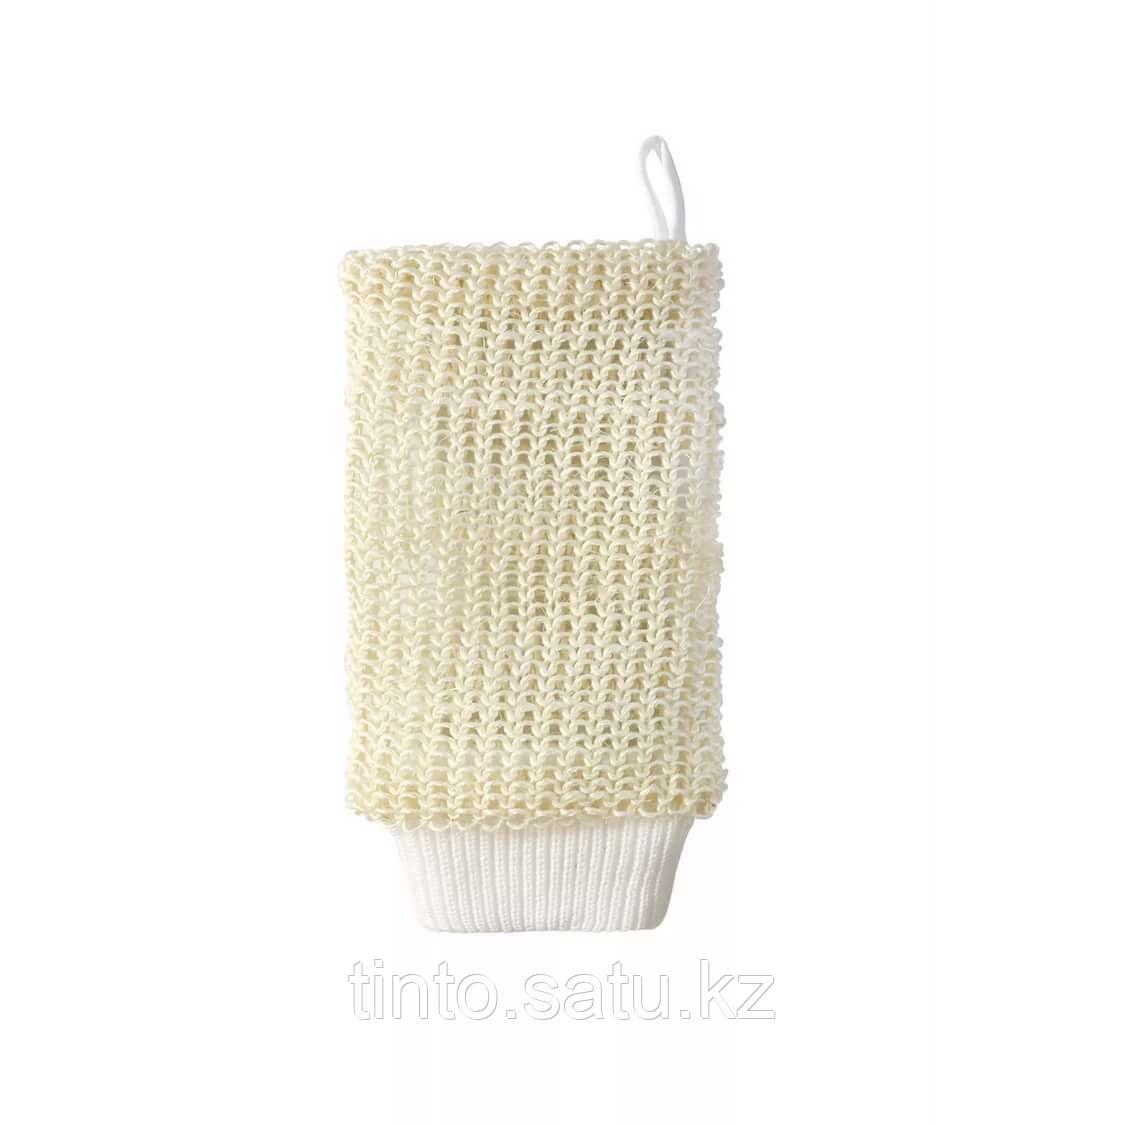 Мочалка-рукавица из сизаля (Мойдодыр)